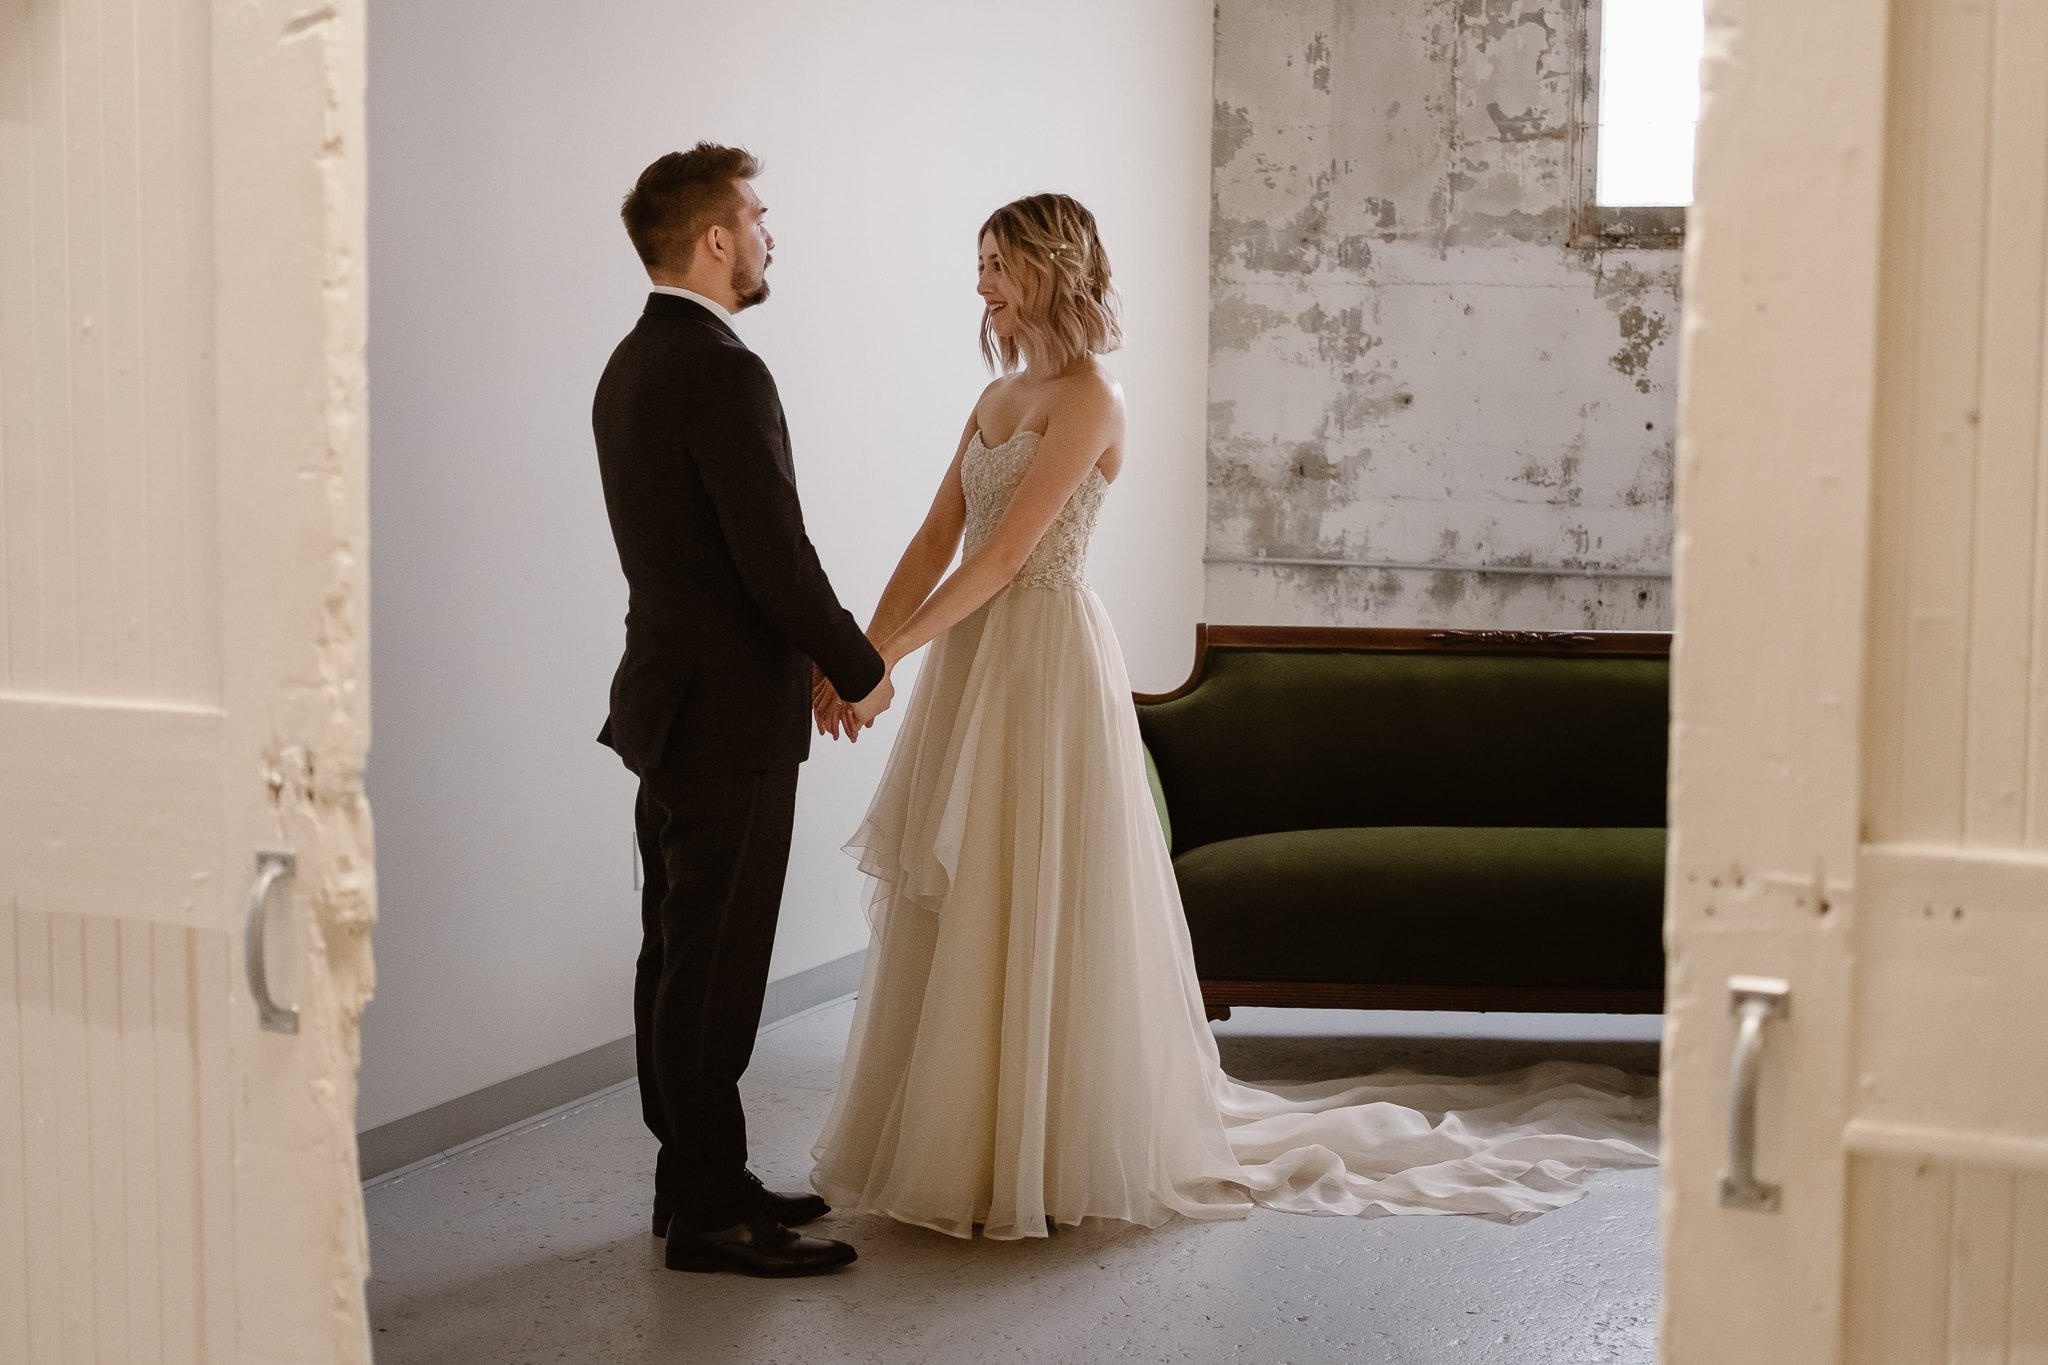 St Vrain Wedding Photographer | Longmont Wedding Photographer | Colorado Winter Wedding Photographer, Colorado industrial chic wedding, bride and groom first look